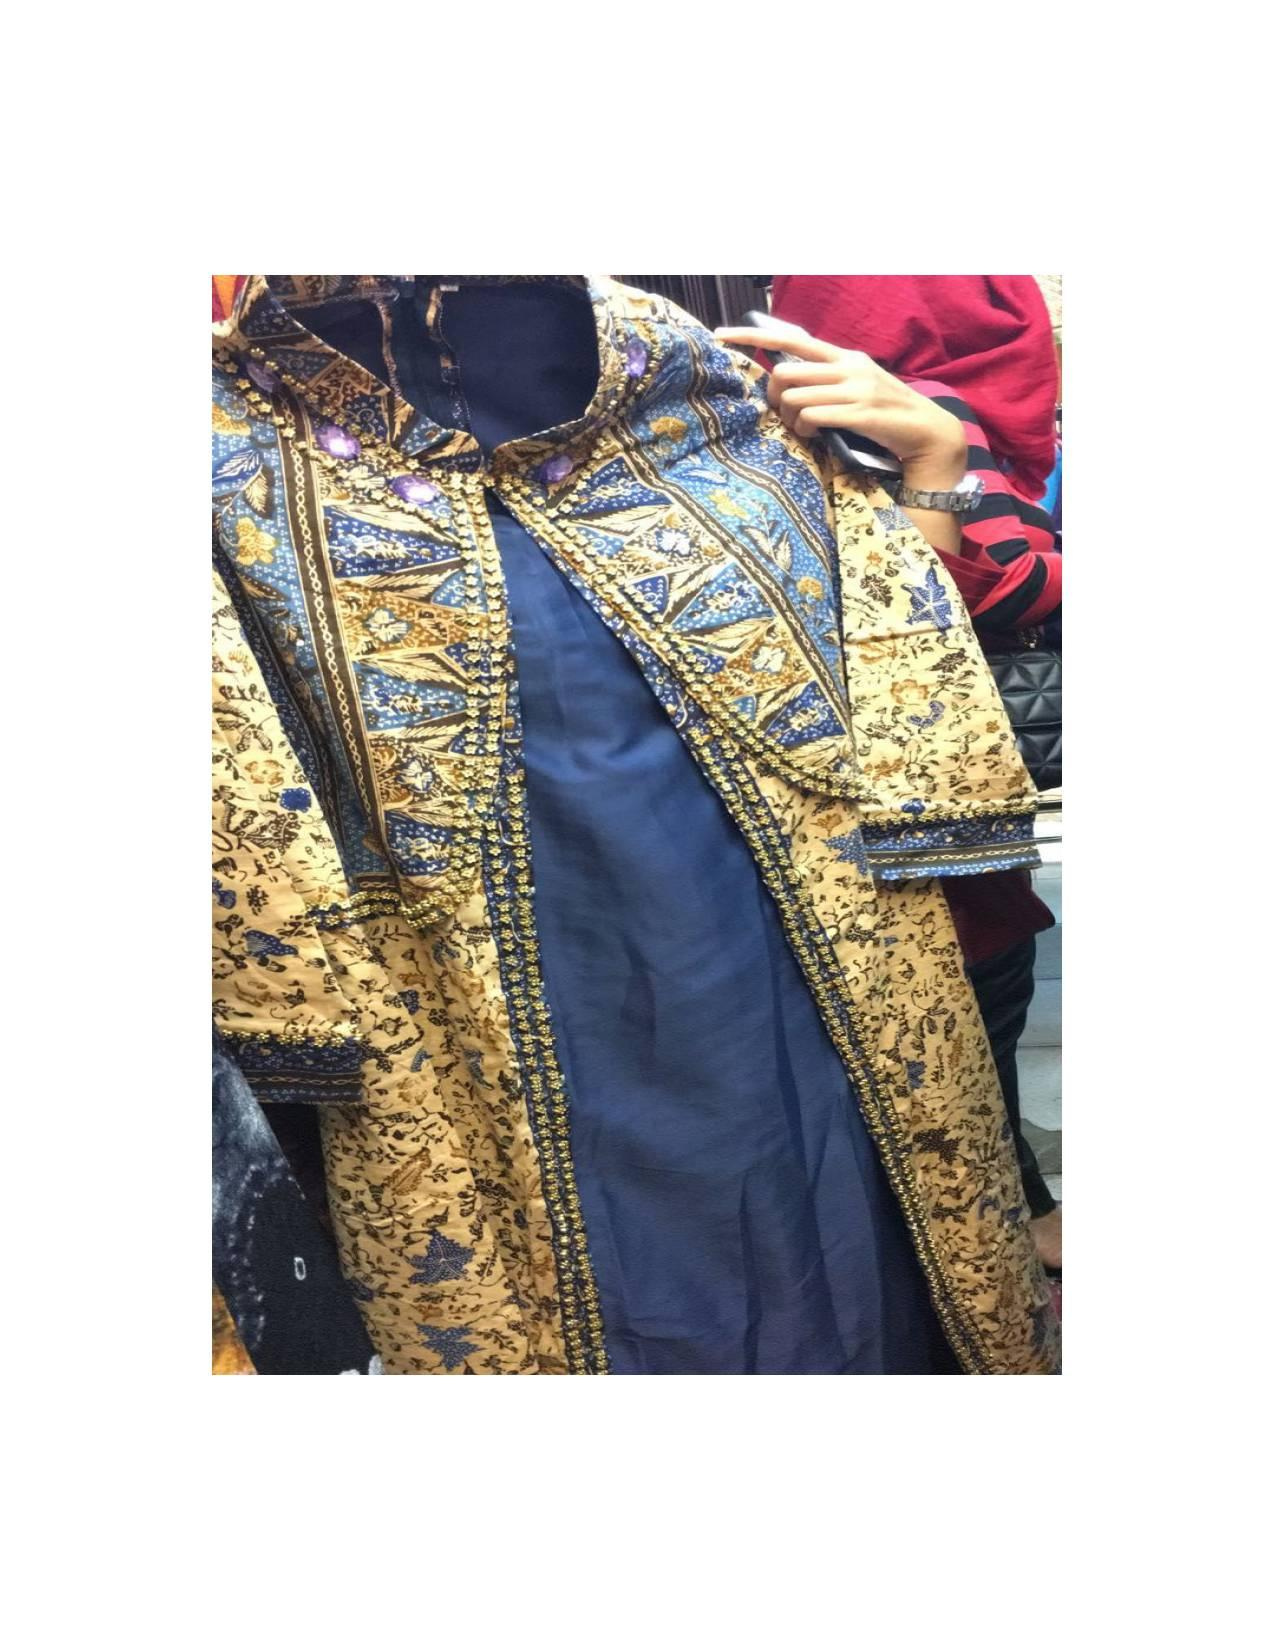 gamis panjang kain batik jupri full payet palembang original jumbo